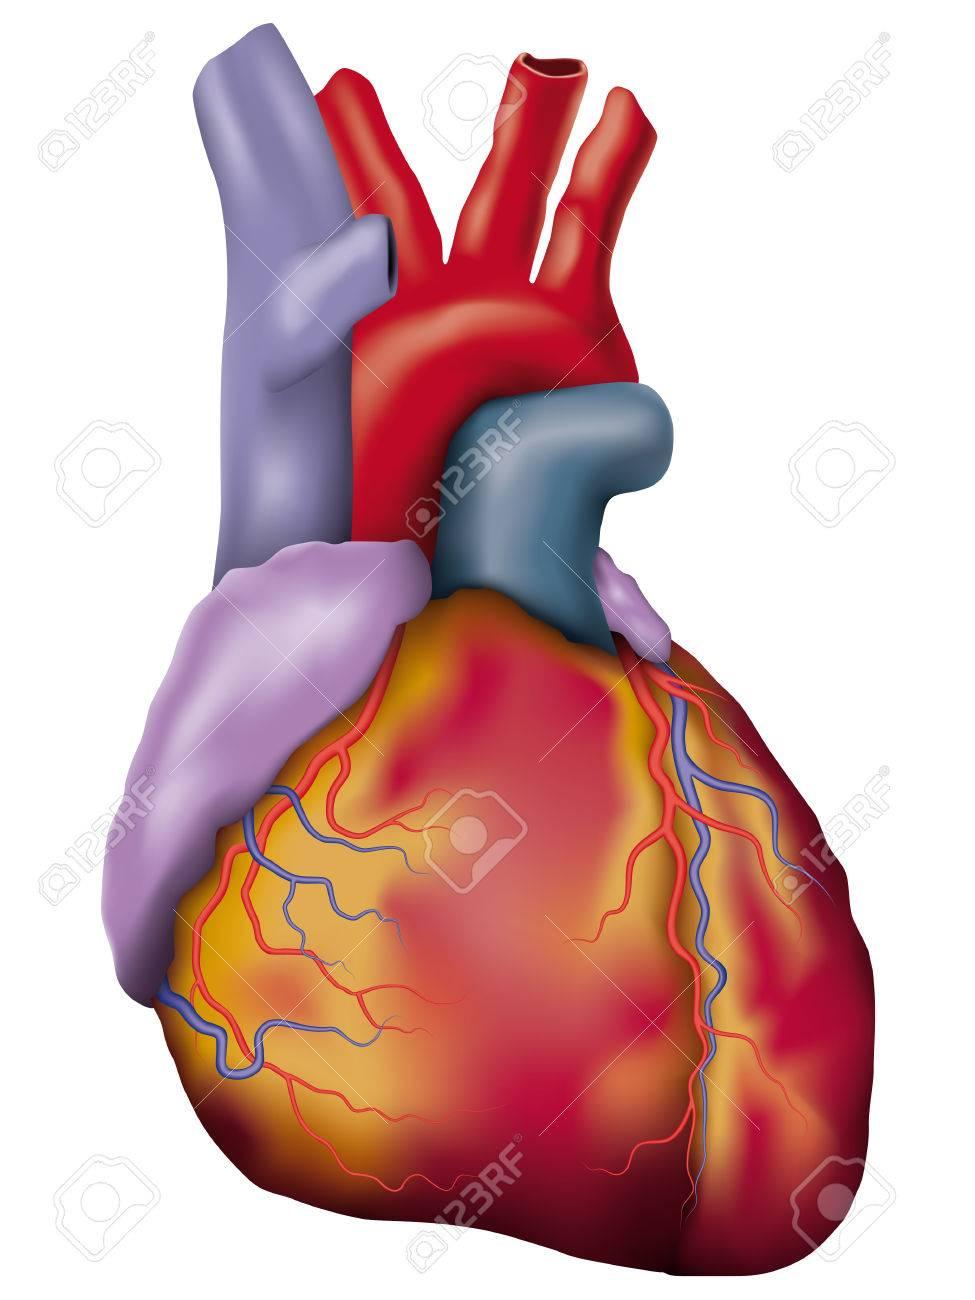 Human Heart Vector Image of Human Heart